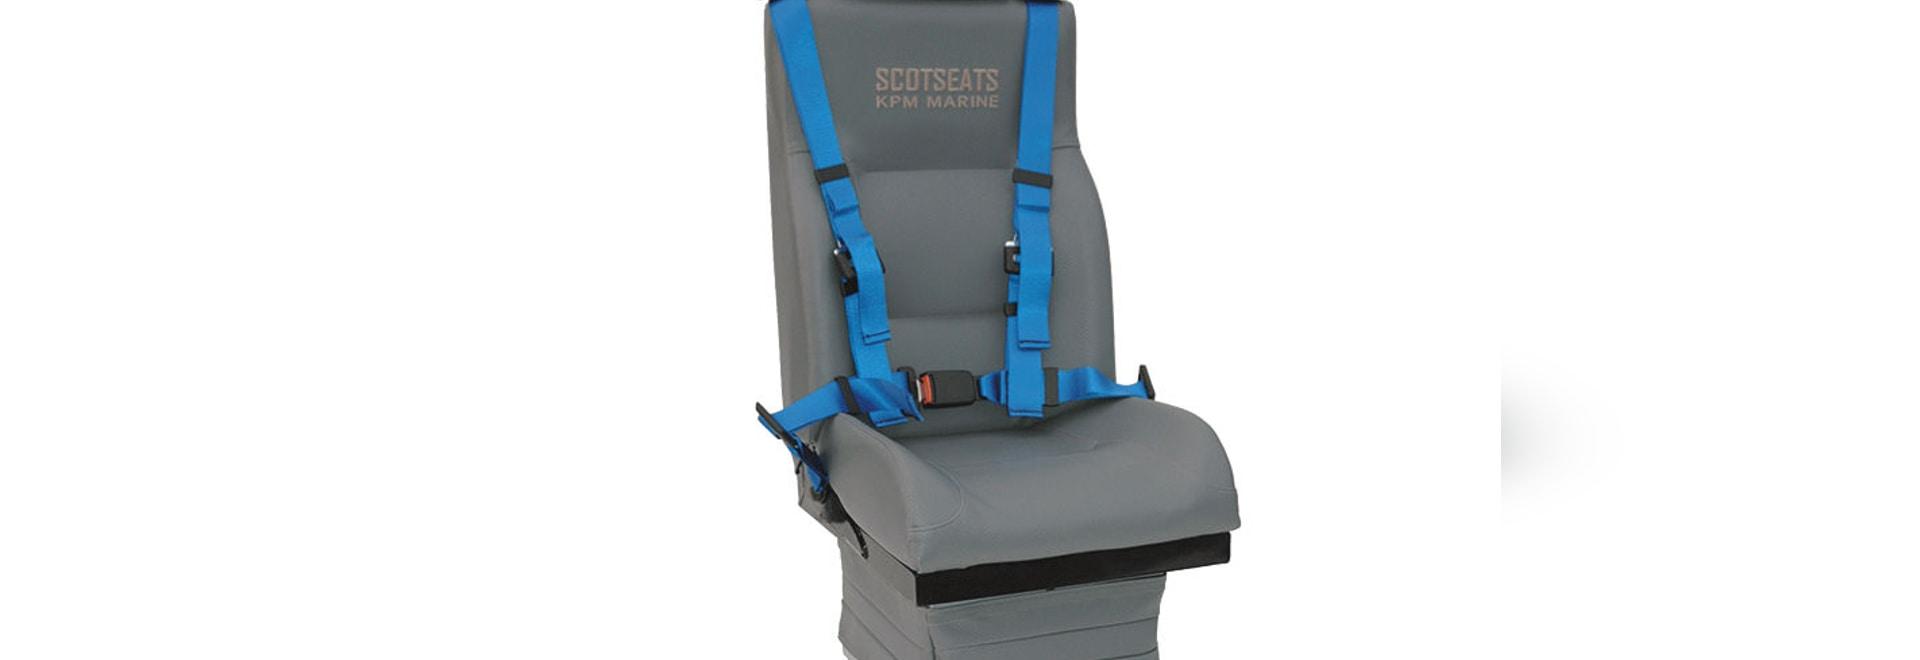 NEW: boat seat by SCOTSEATS DIRECT LTD